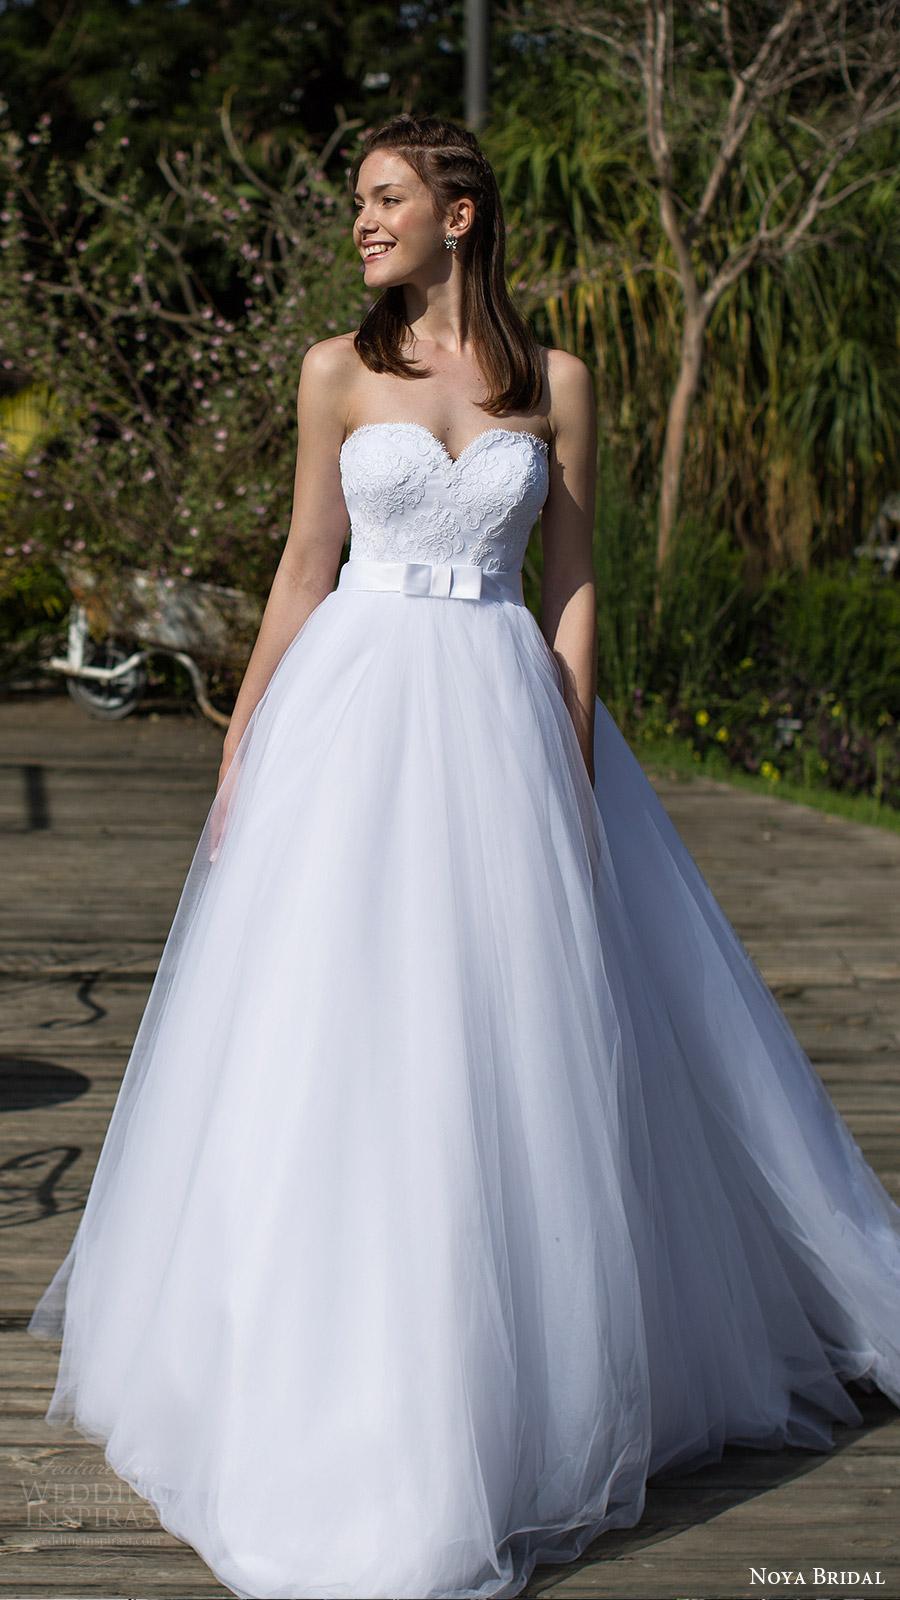 noya bridal 2016 3 strapless sweetheart ball gown wedding dress (1210) mv princess romantic